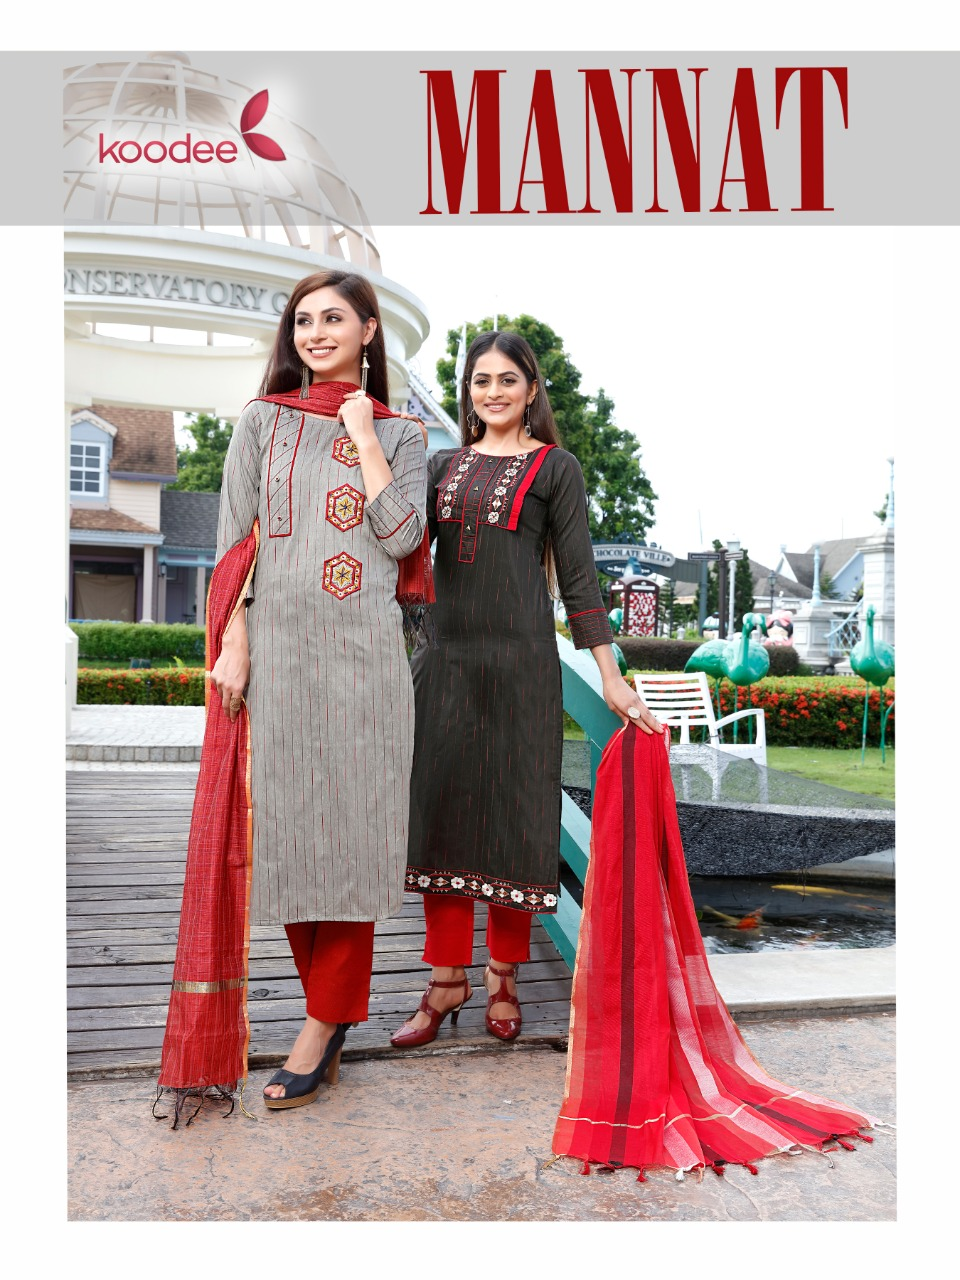 Koodee Mannat Womens Kurtia With Pants Dupatta Set Online